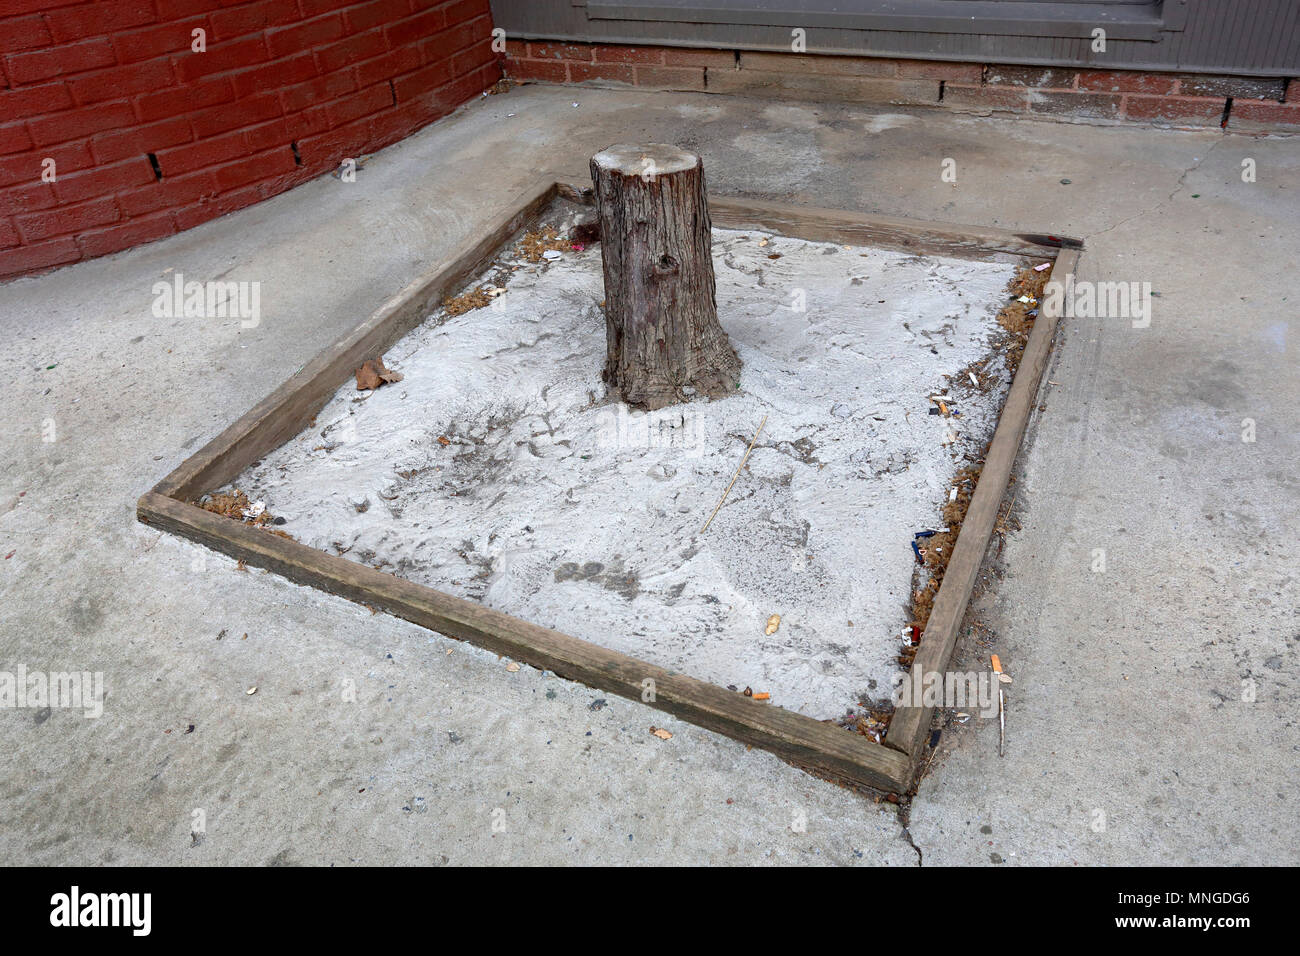 dead tree stump covered in concrete - Stock Image